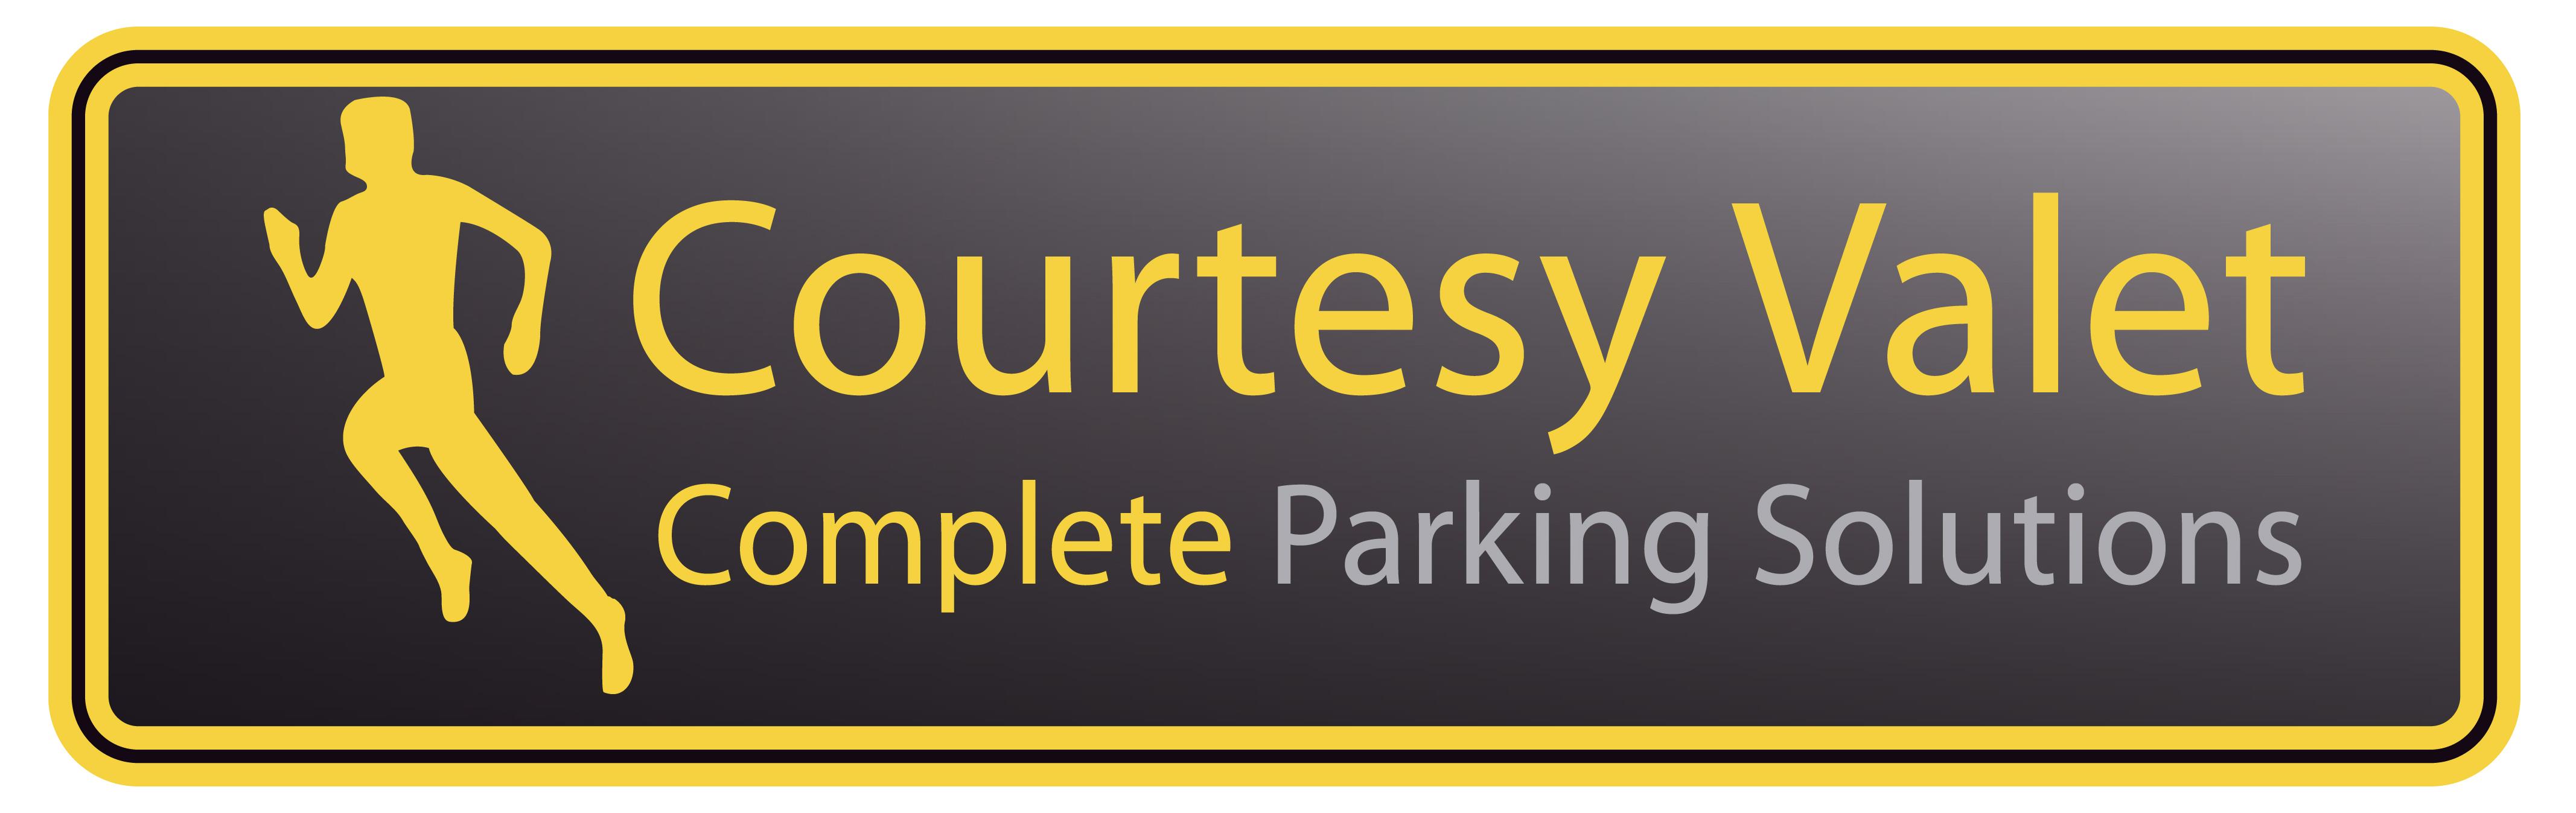 Courtesy Valet Parking Services